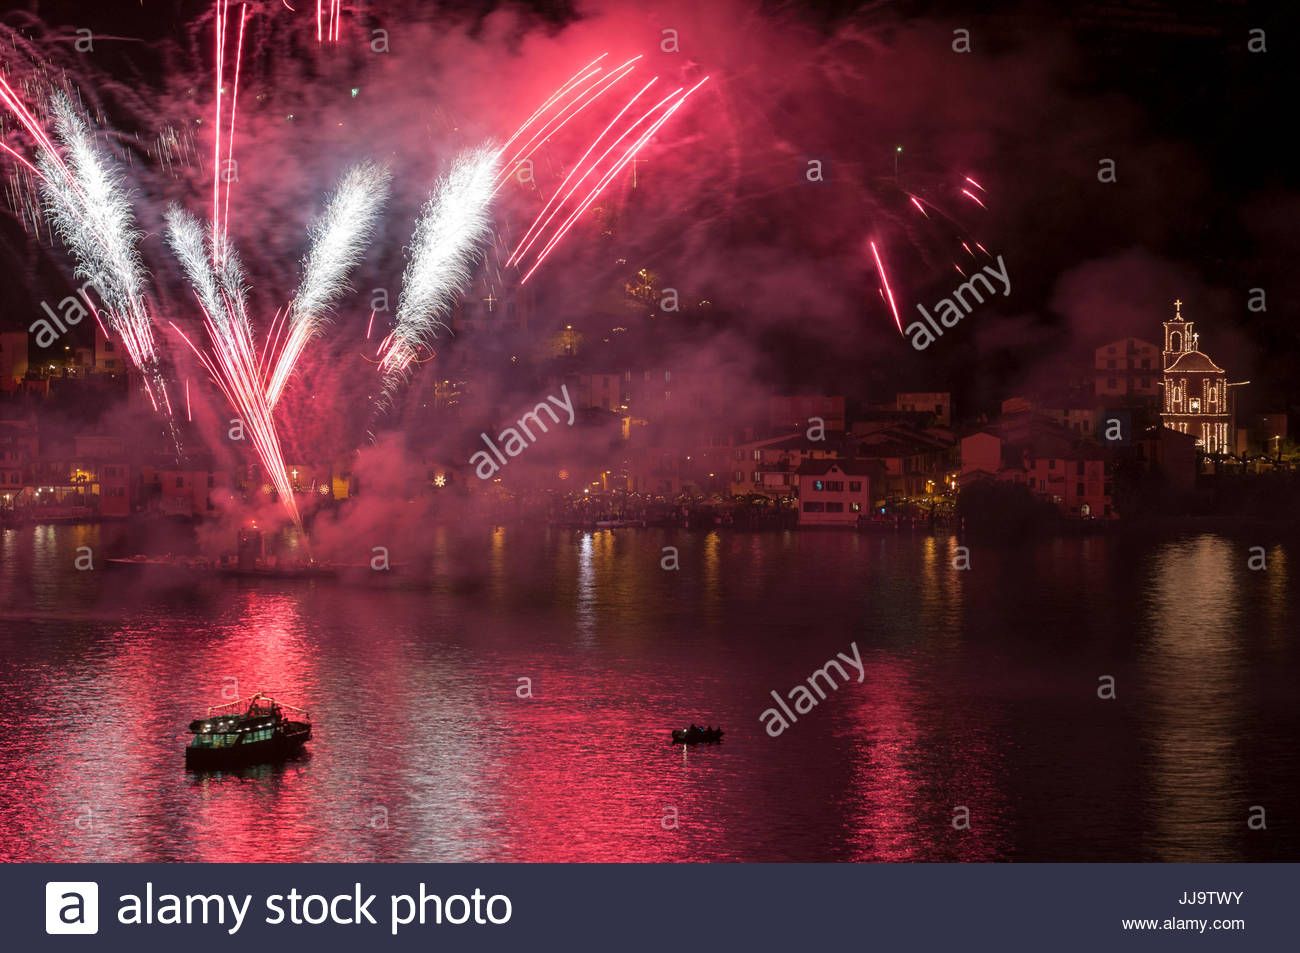 Fireworks, Festa di Santa Croce, Carzano, Lake Iseo, Italy - Stock Image